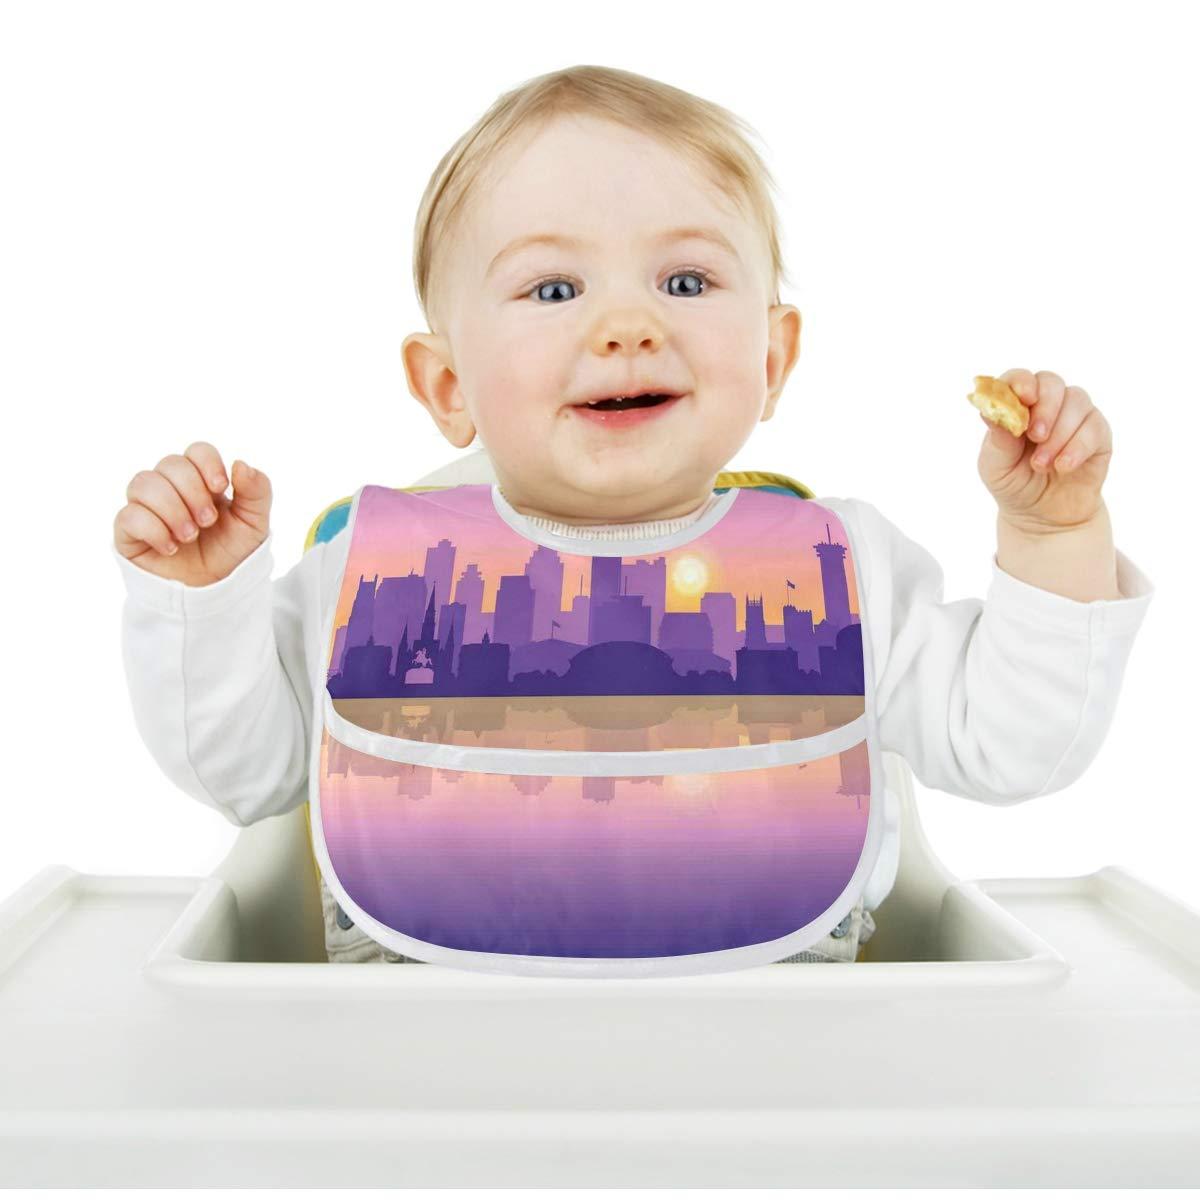 spit happens Unisex Saliva Baby Bibs washable reusable